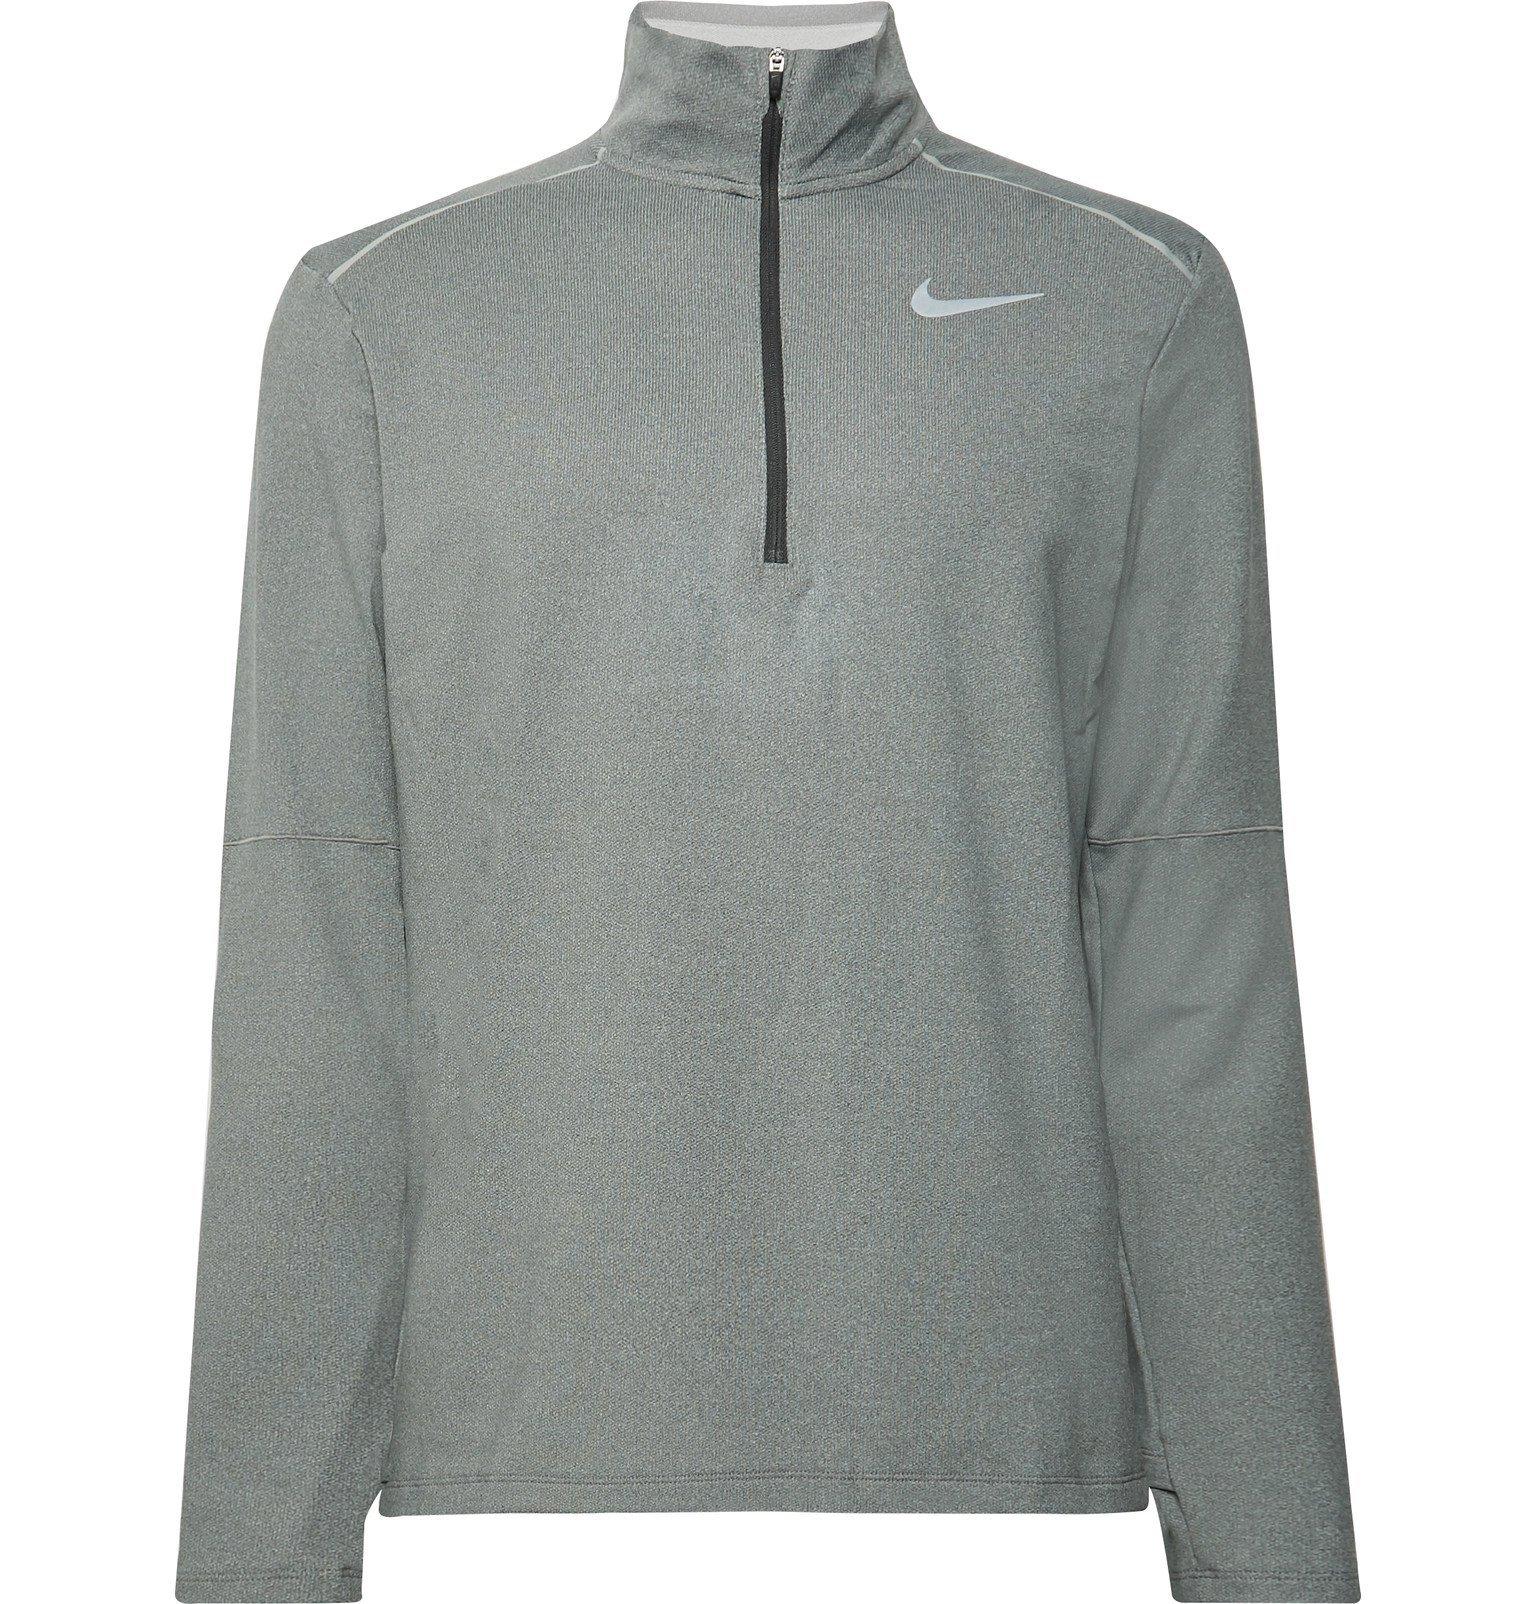 Nike Running - Element 3.0 Loopback Dri-FIT Half-Zip Top - Gray